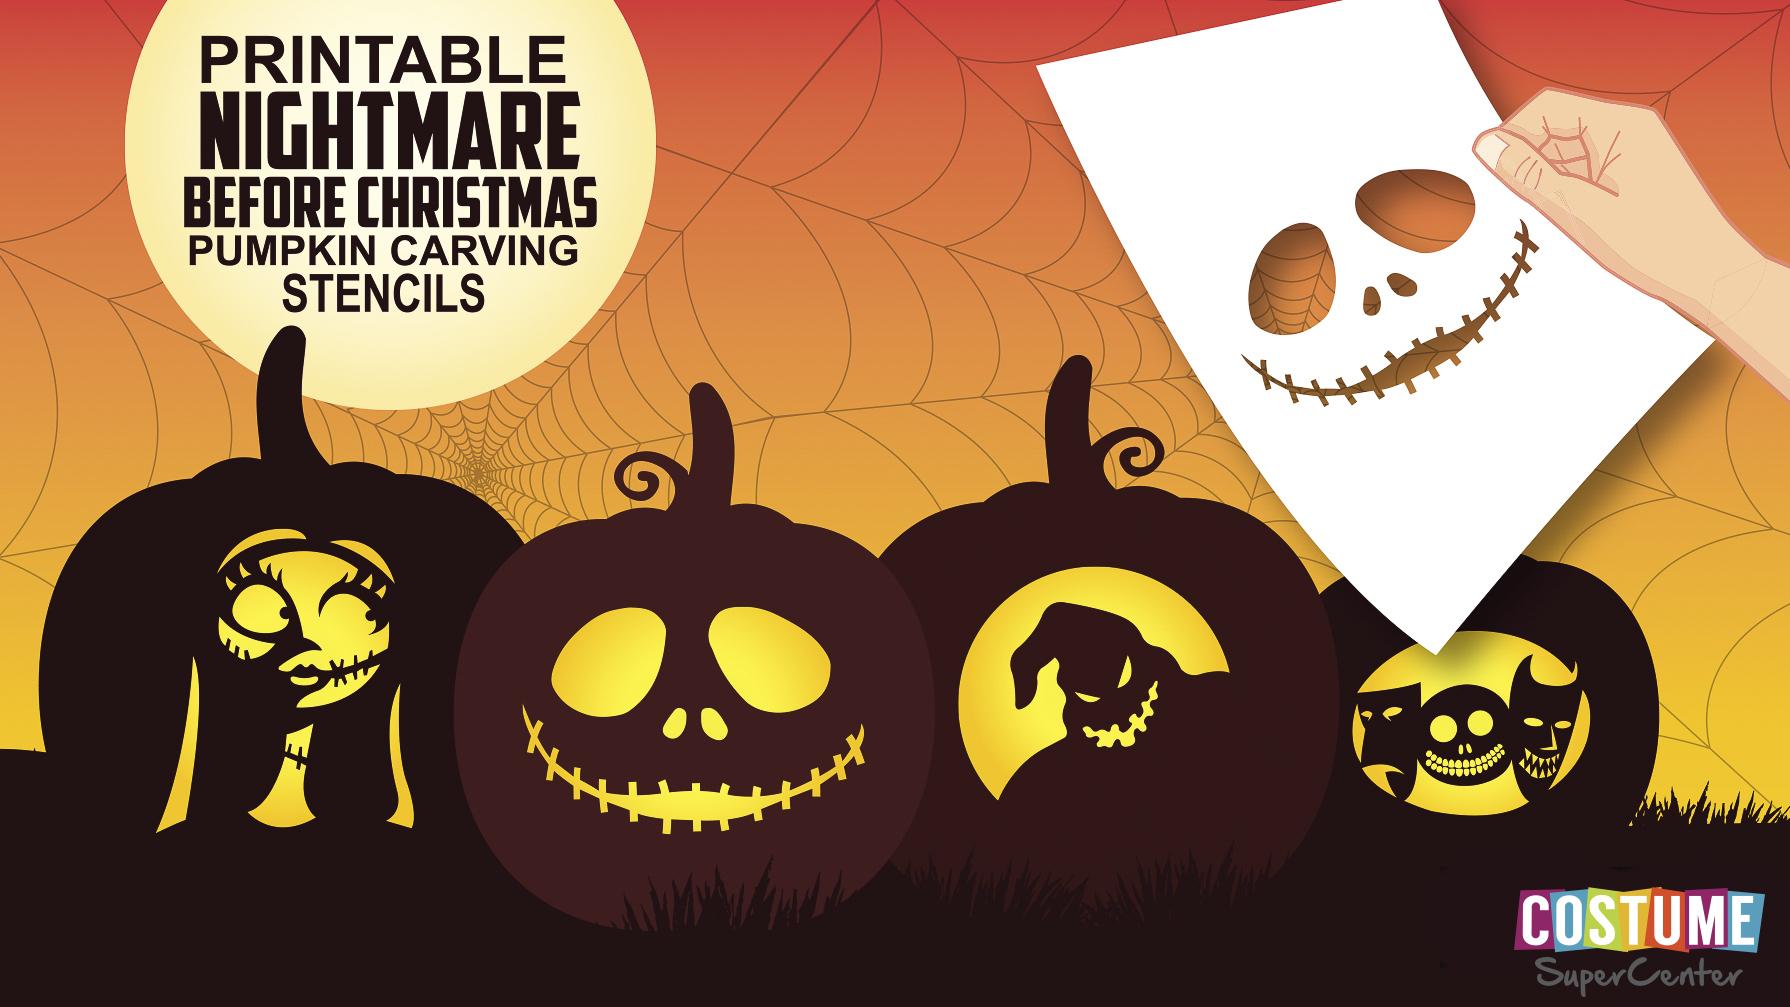 Nightmare Before Christmas Pumpkin Carving Stencils | Costume - Free Printable Pumpkin Stencils